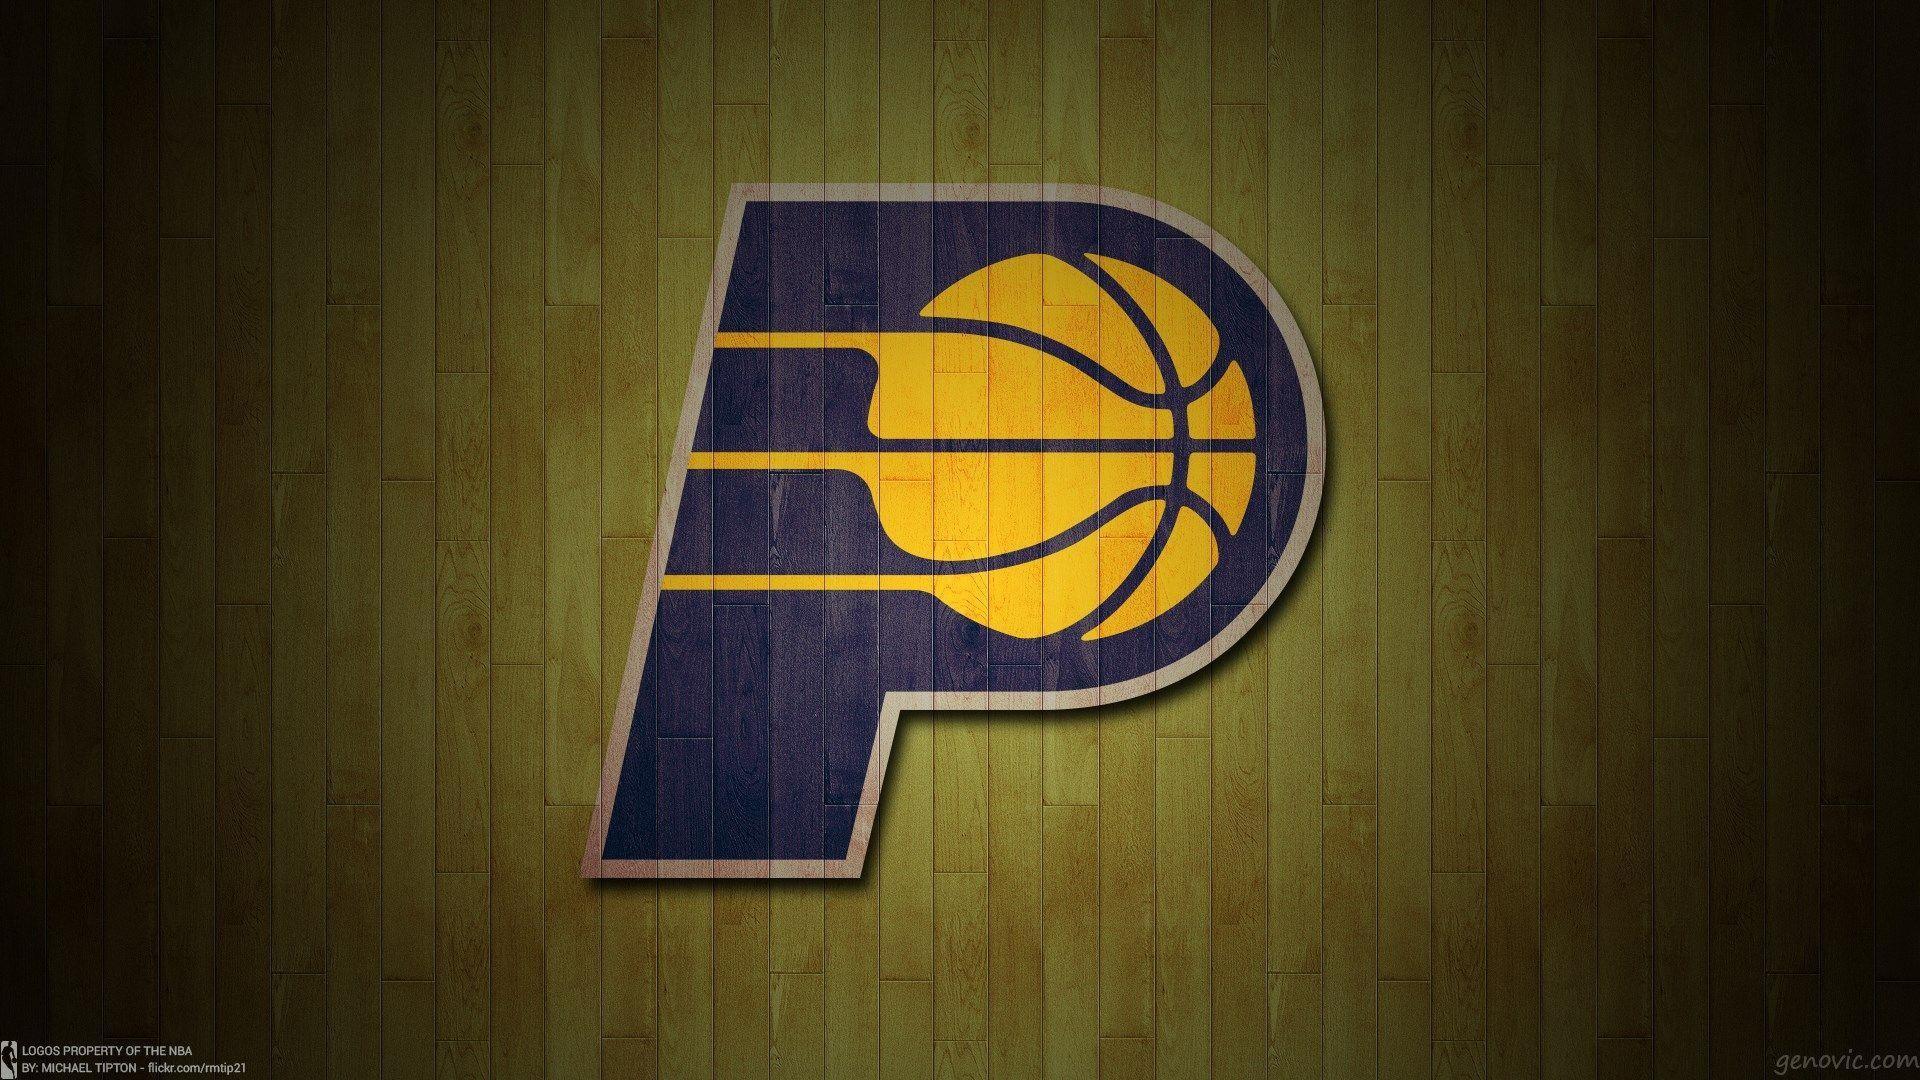 NBA Team Logos Wallpapers 2015 – Wallpaper Cave